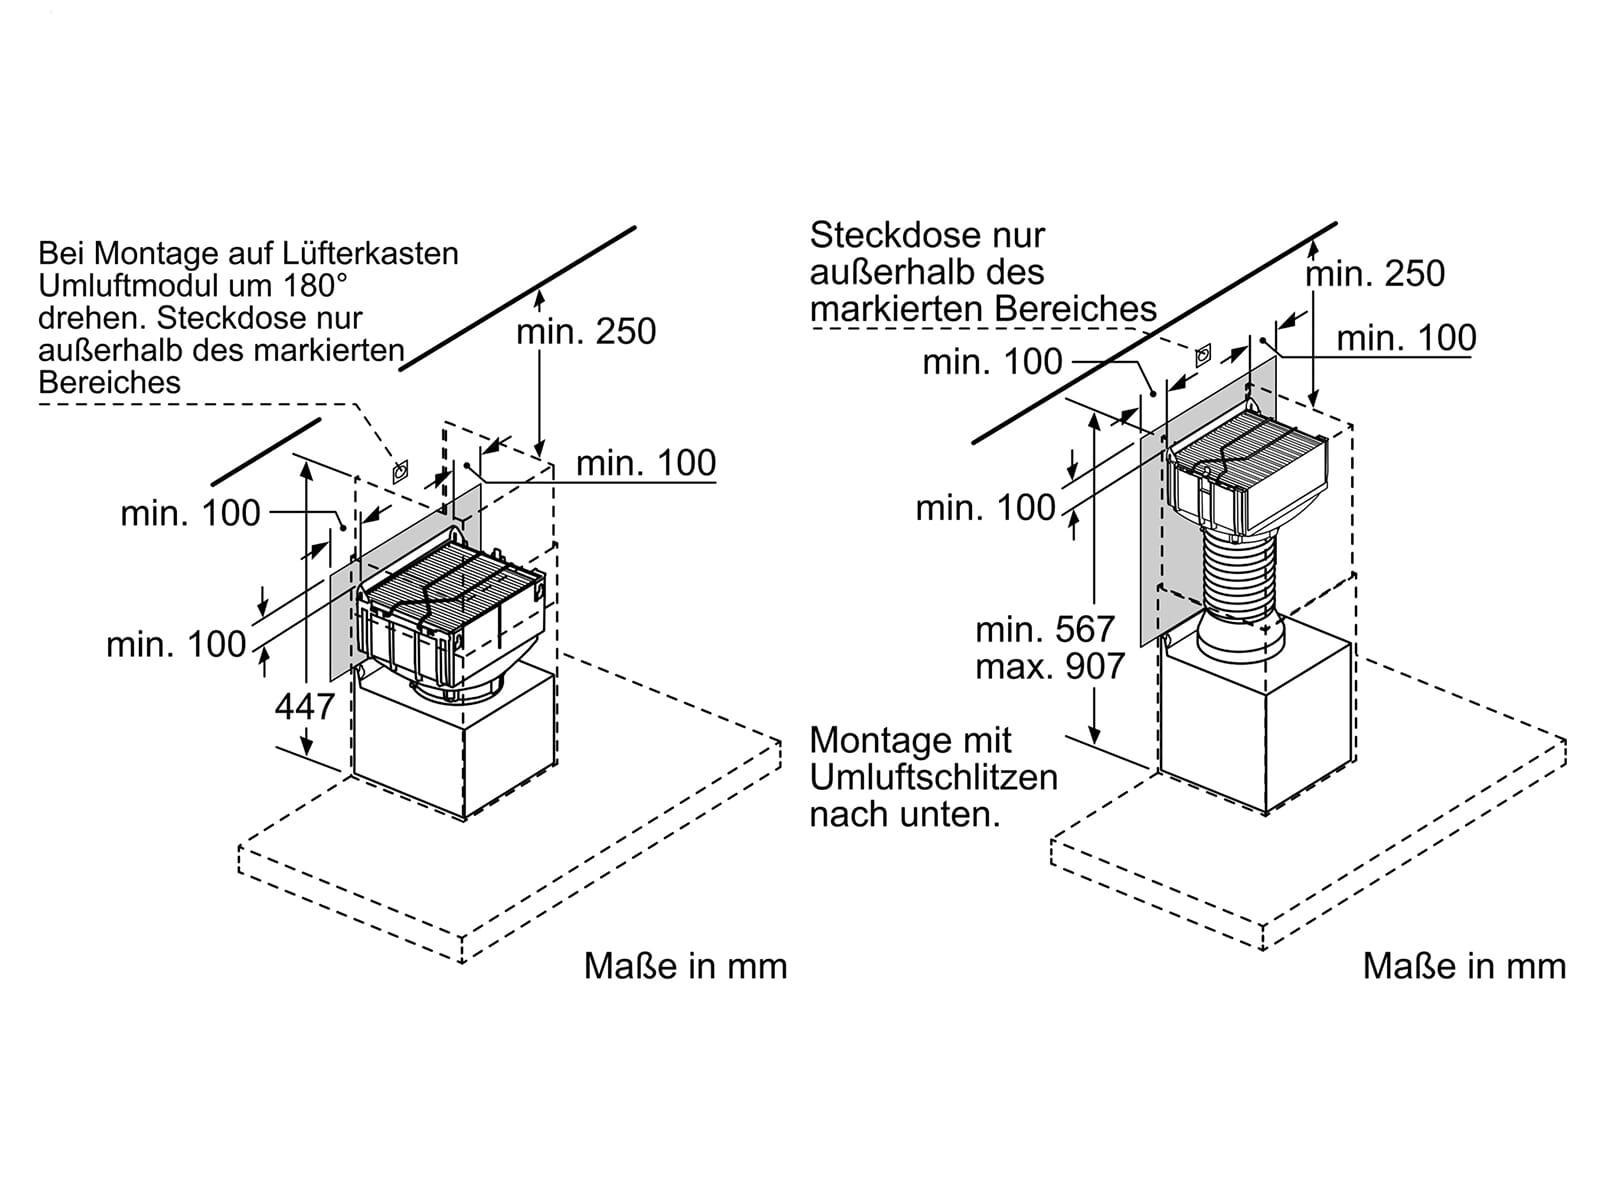 Siemens LZ11CXI16 Clean Air Plus Umluftset